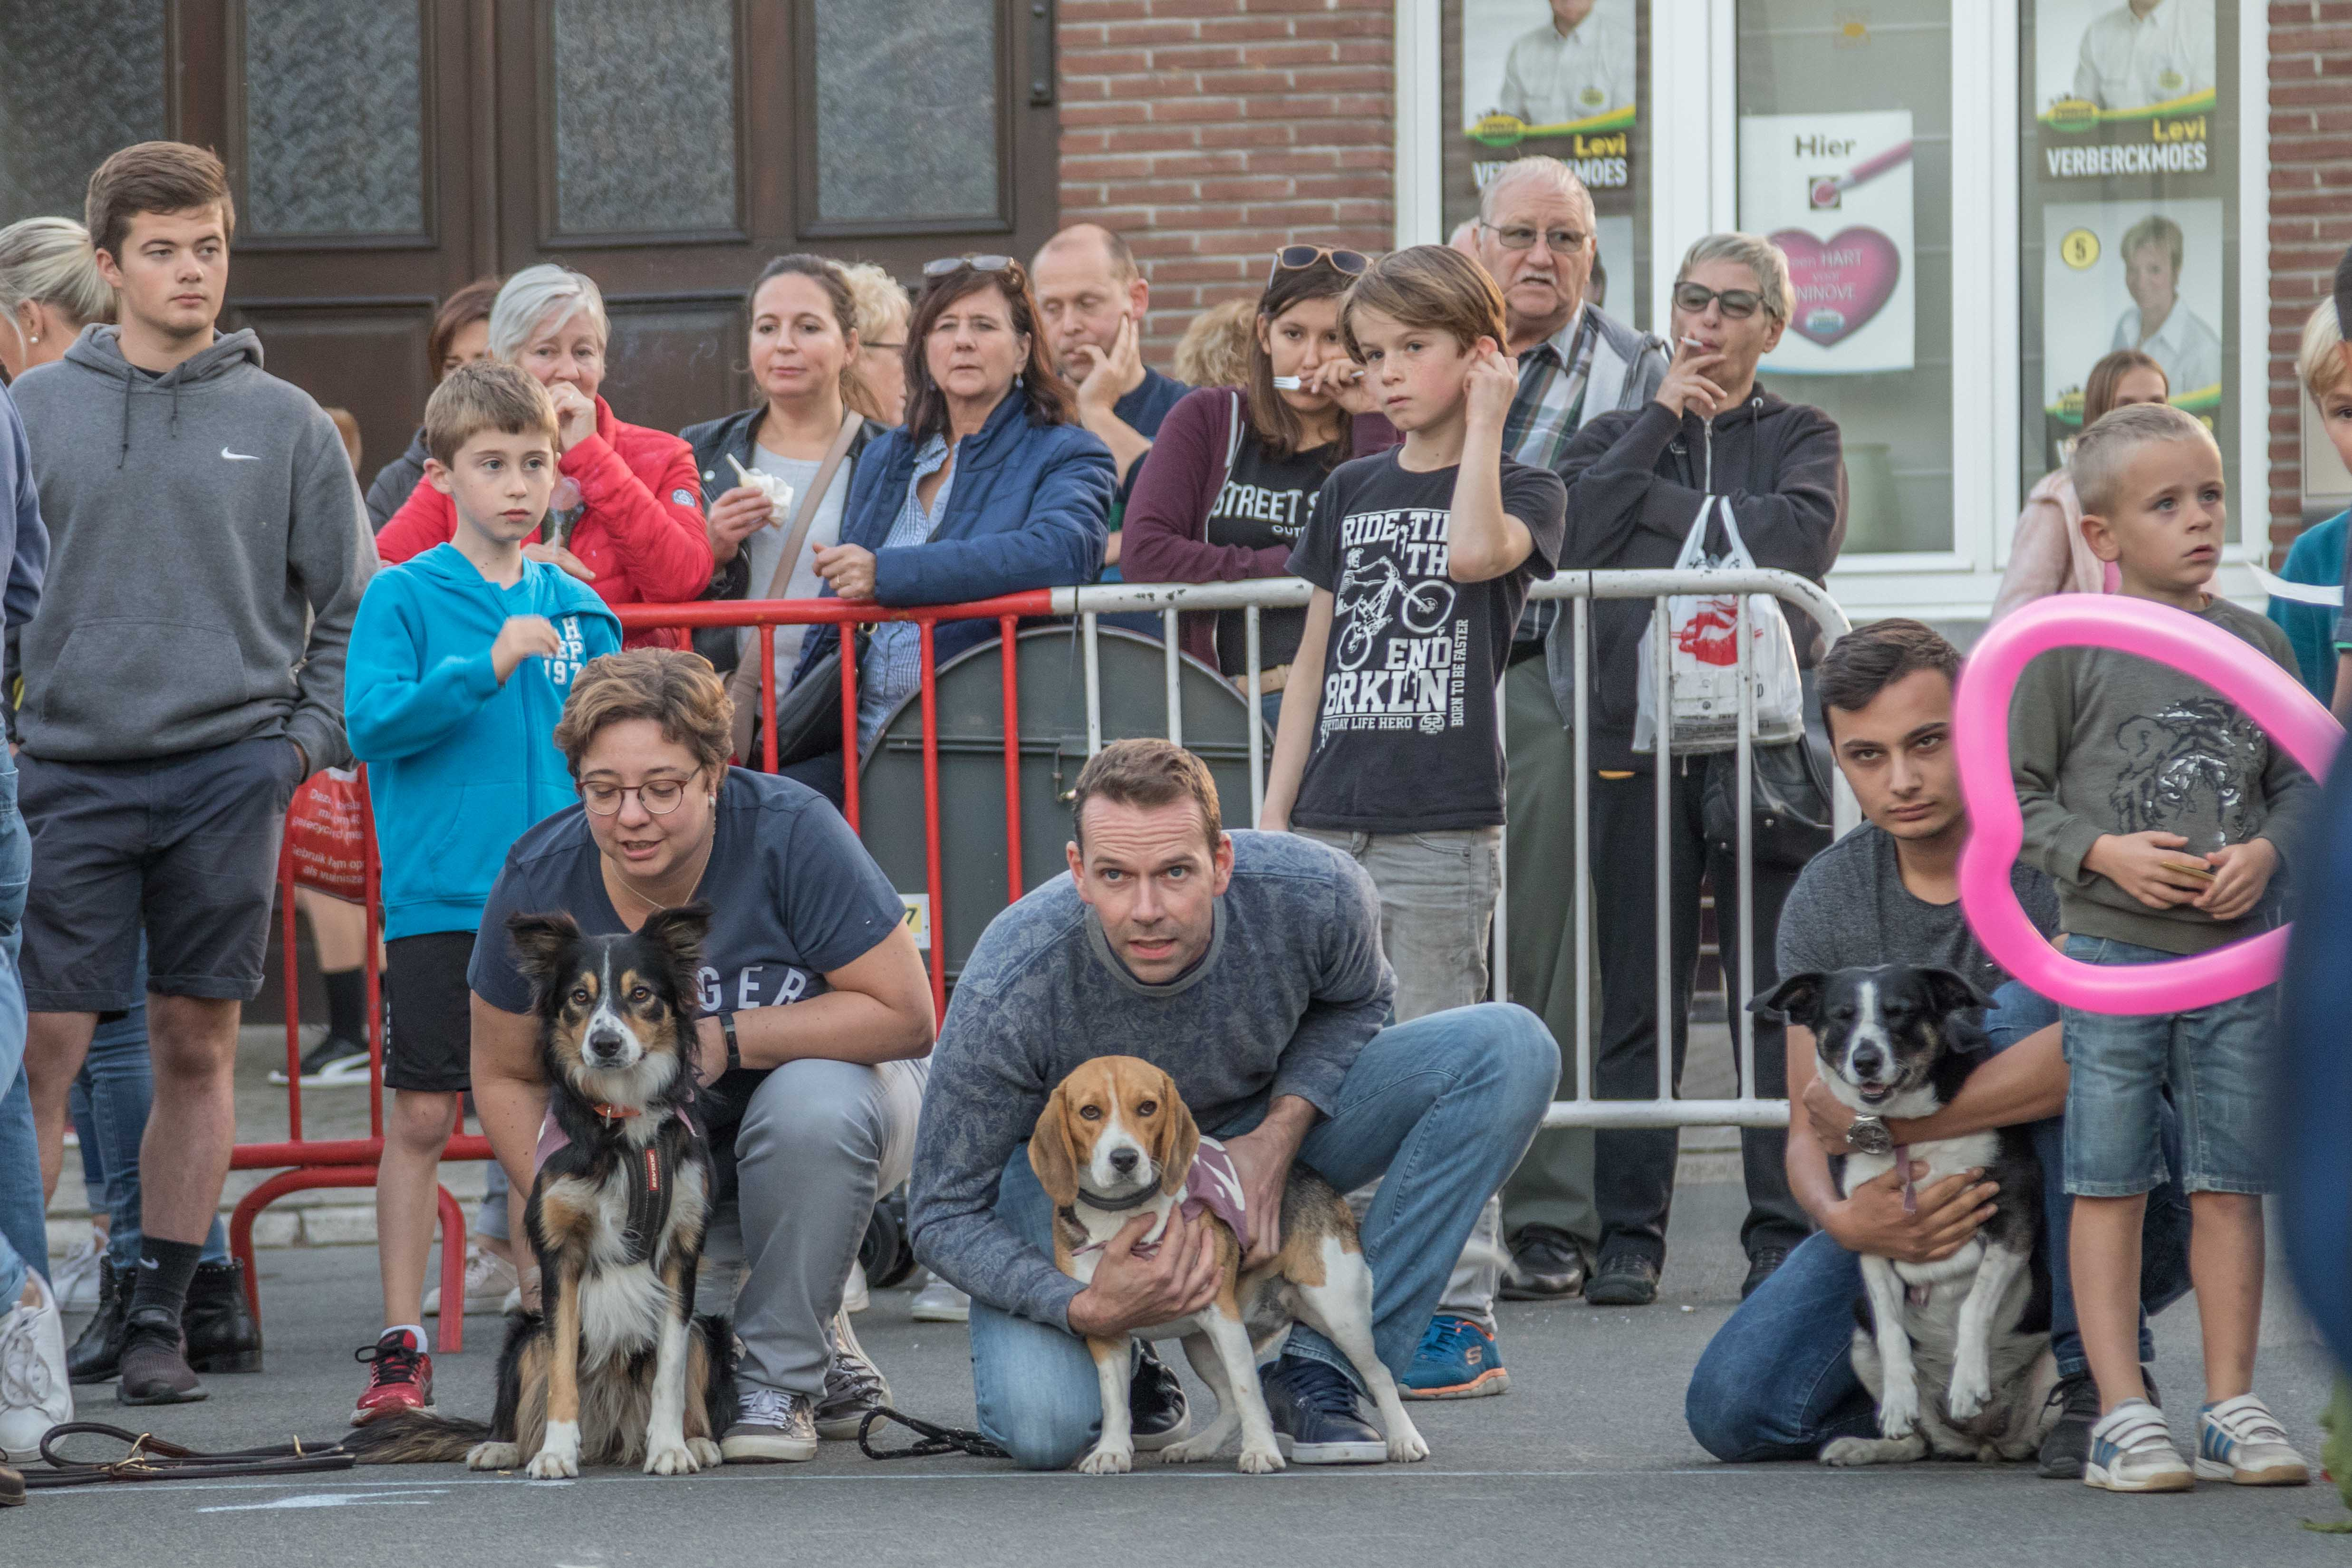 93ste hondenkoers te Appelterre-Eichem